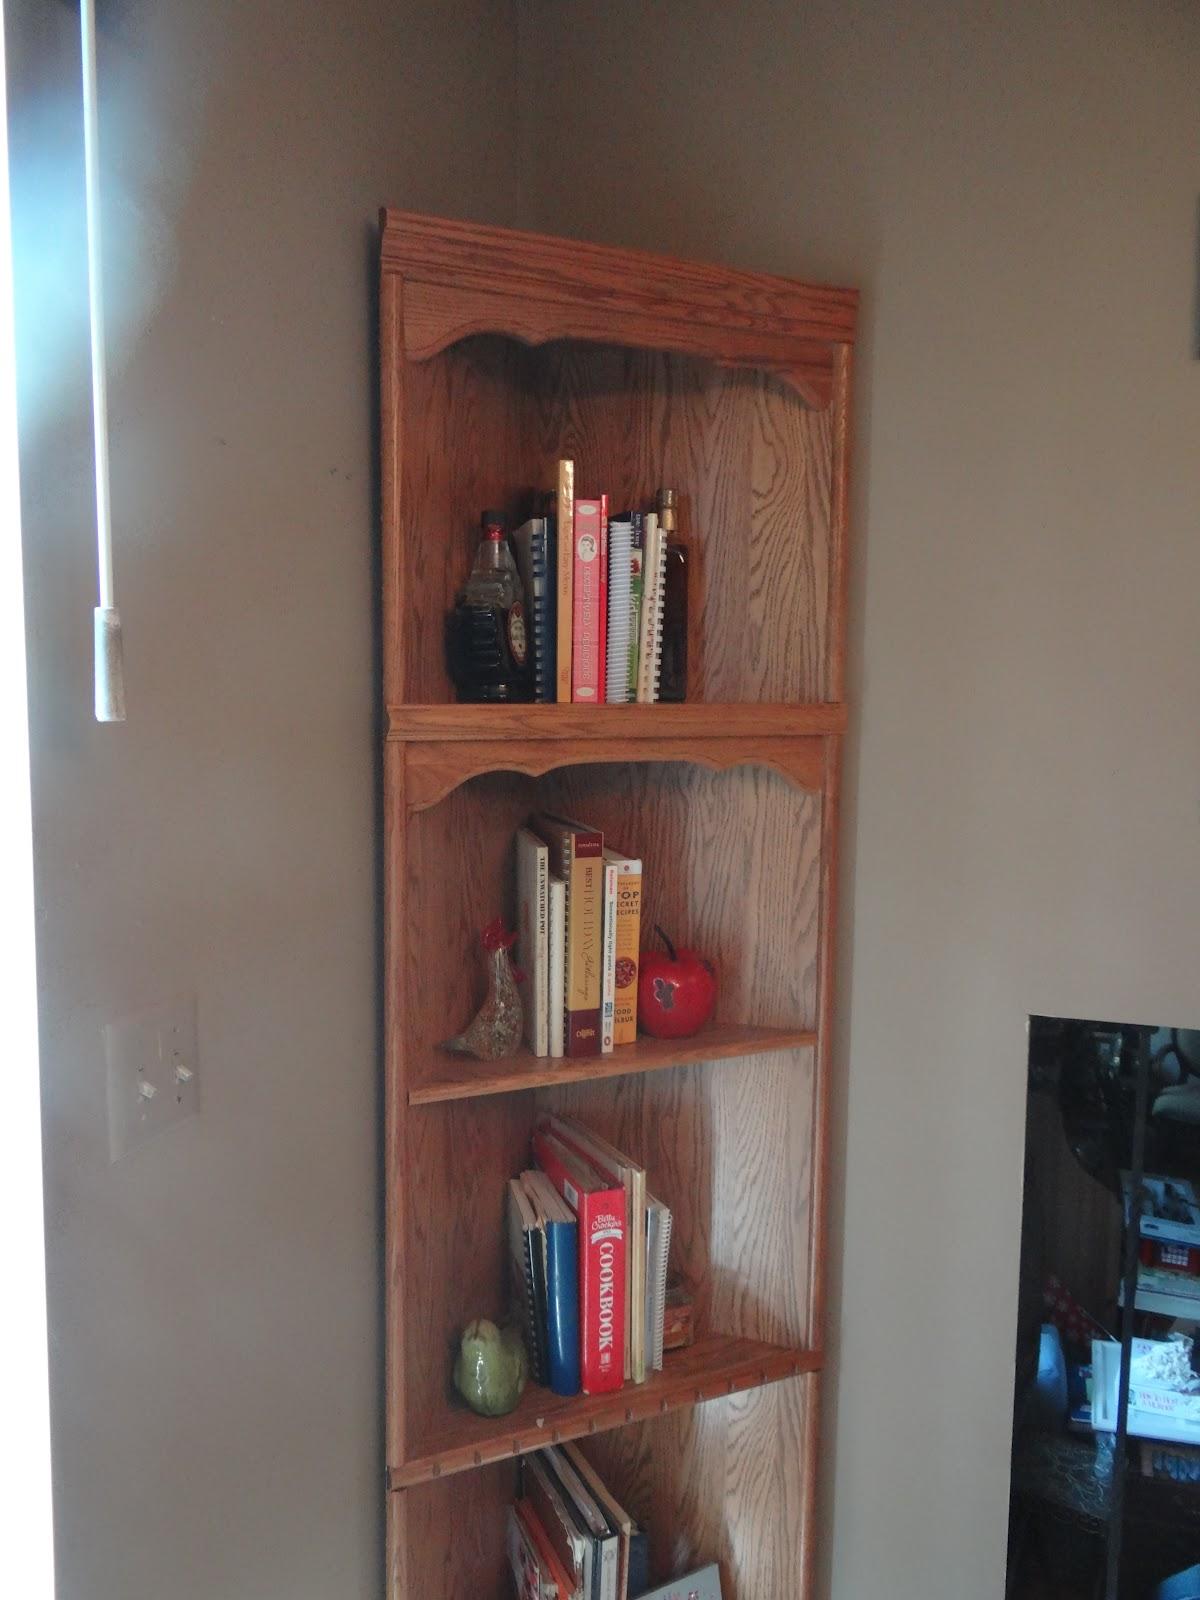 My Food Storage Cookbook - Tried and Tested Food Storage ...